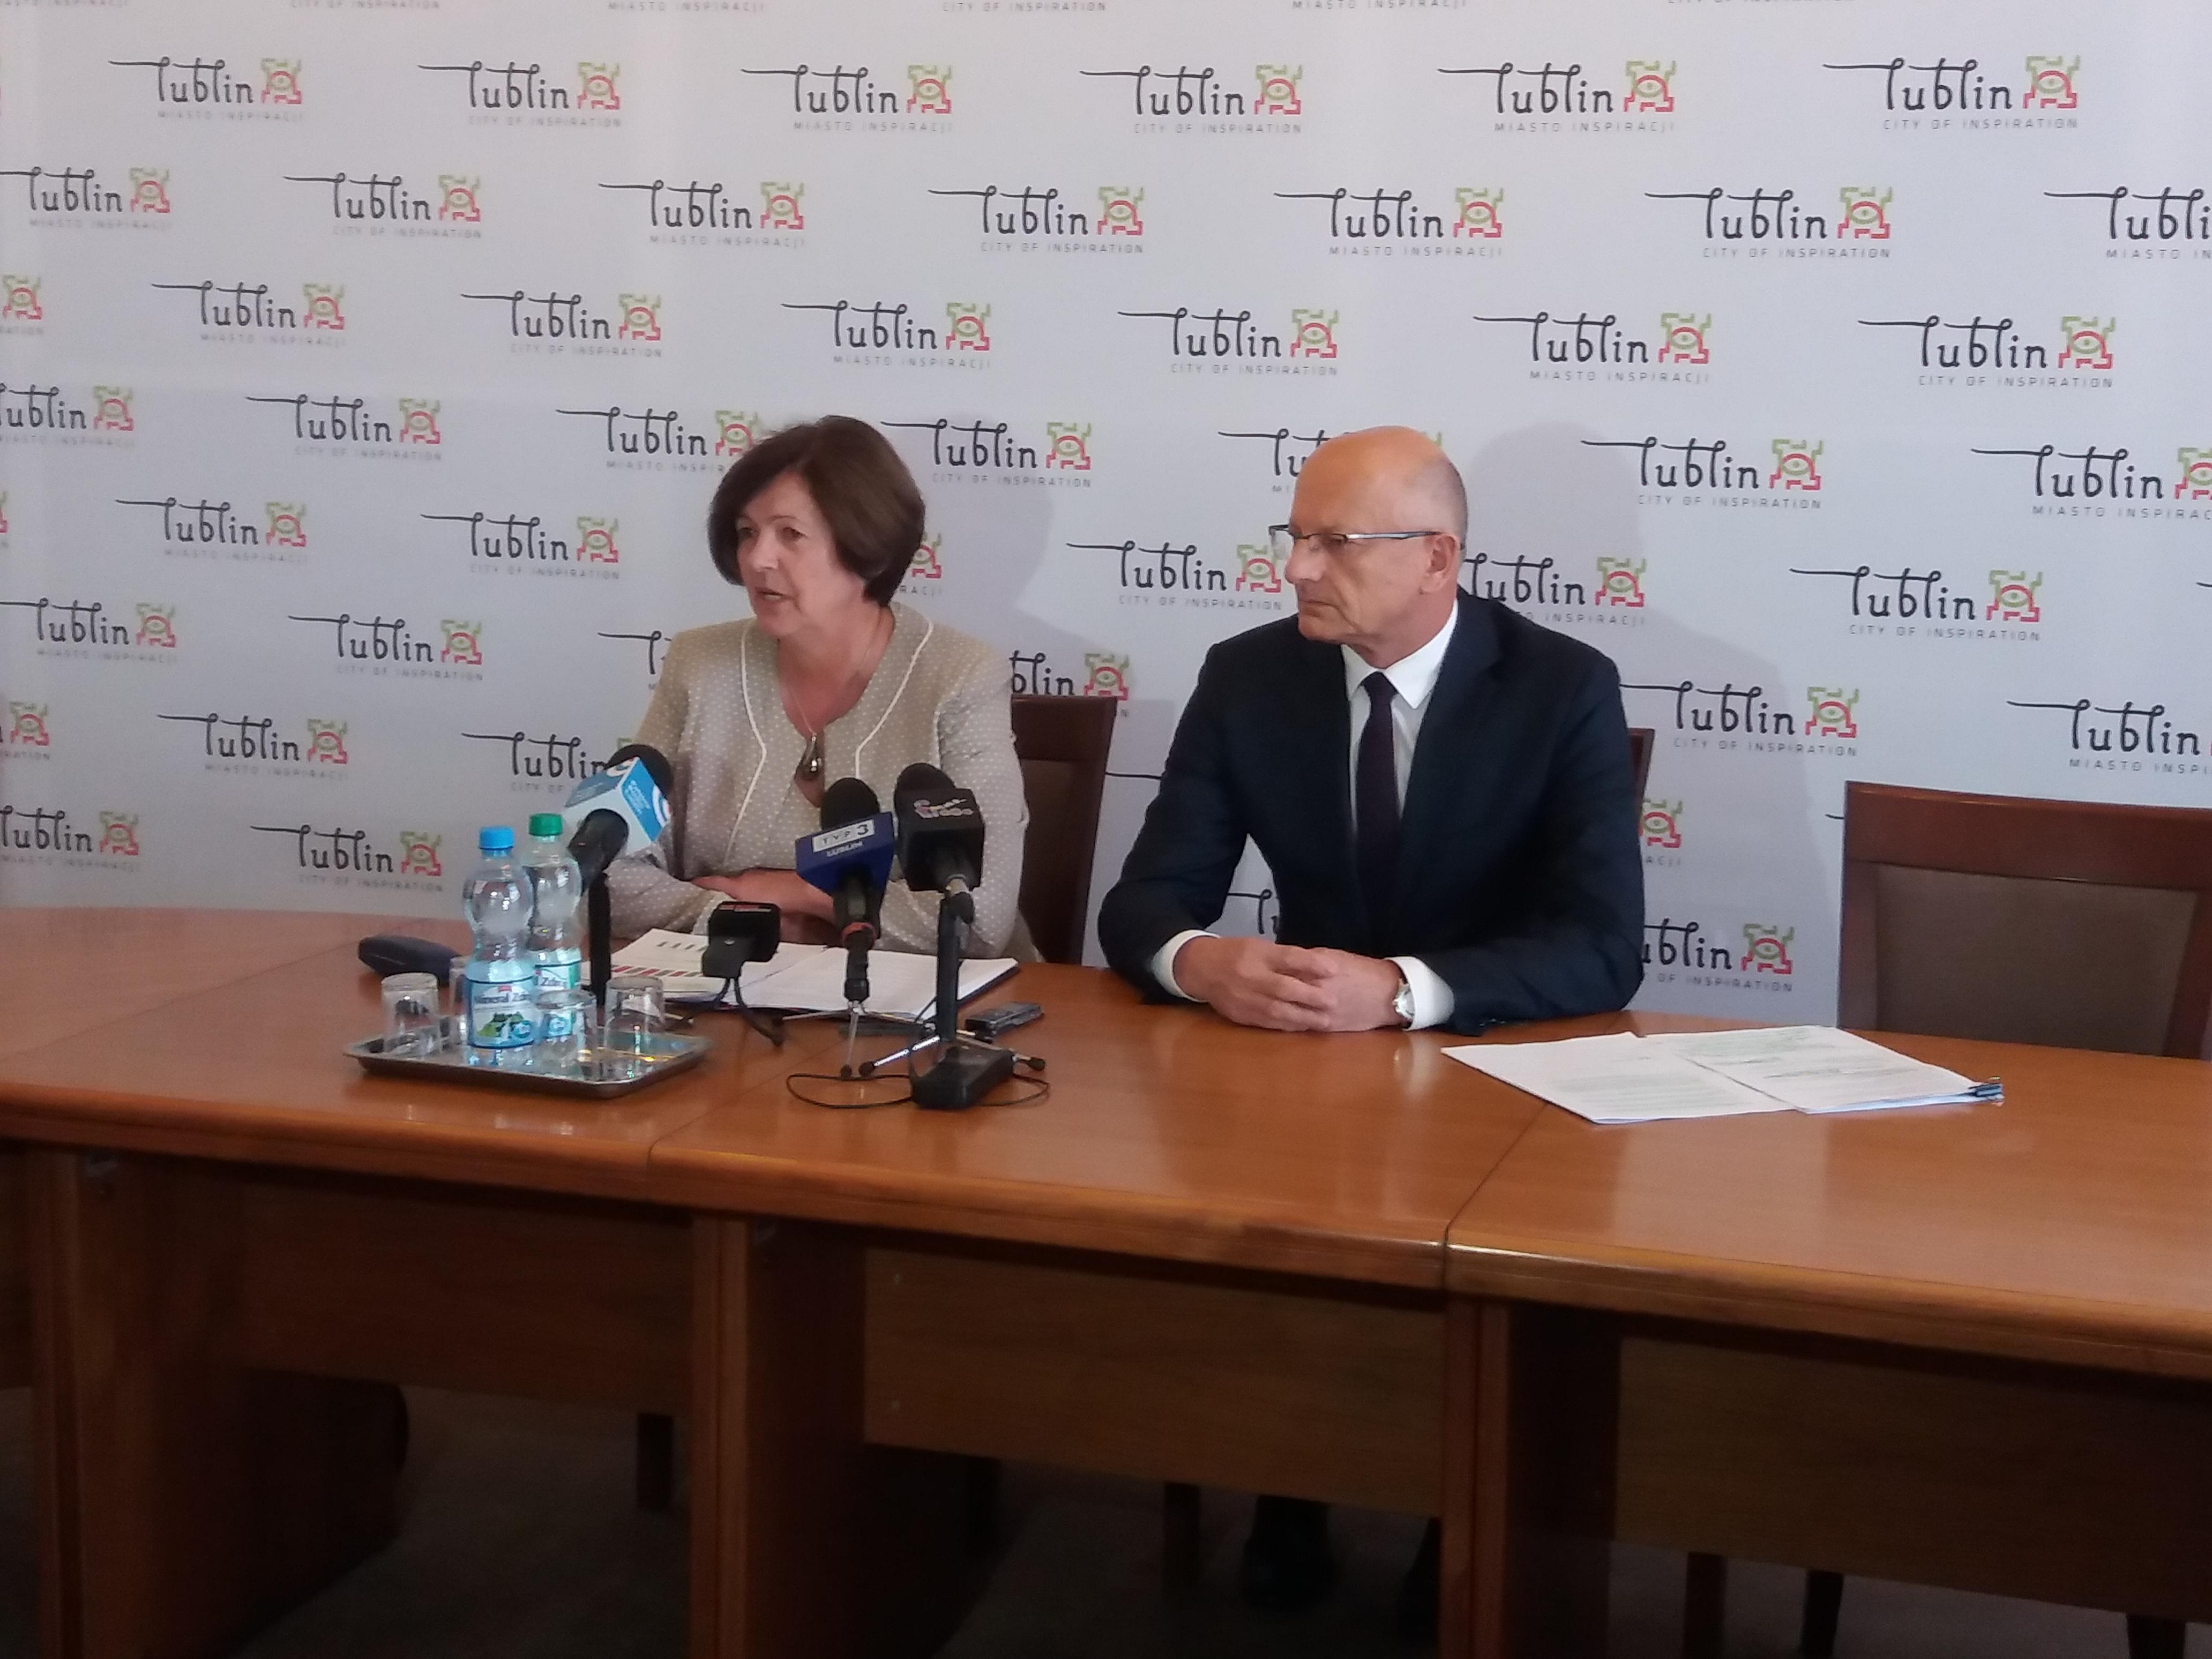 Prezydent Lublina oburzony słowami kandydata na prezydenta miasta Jakuba Kuleszy